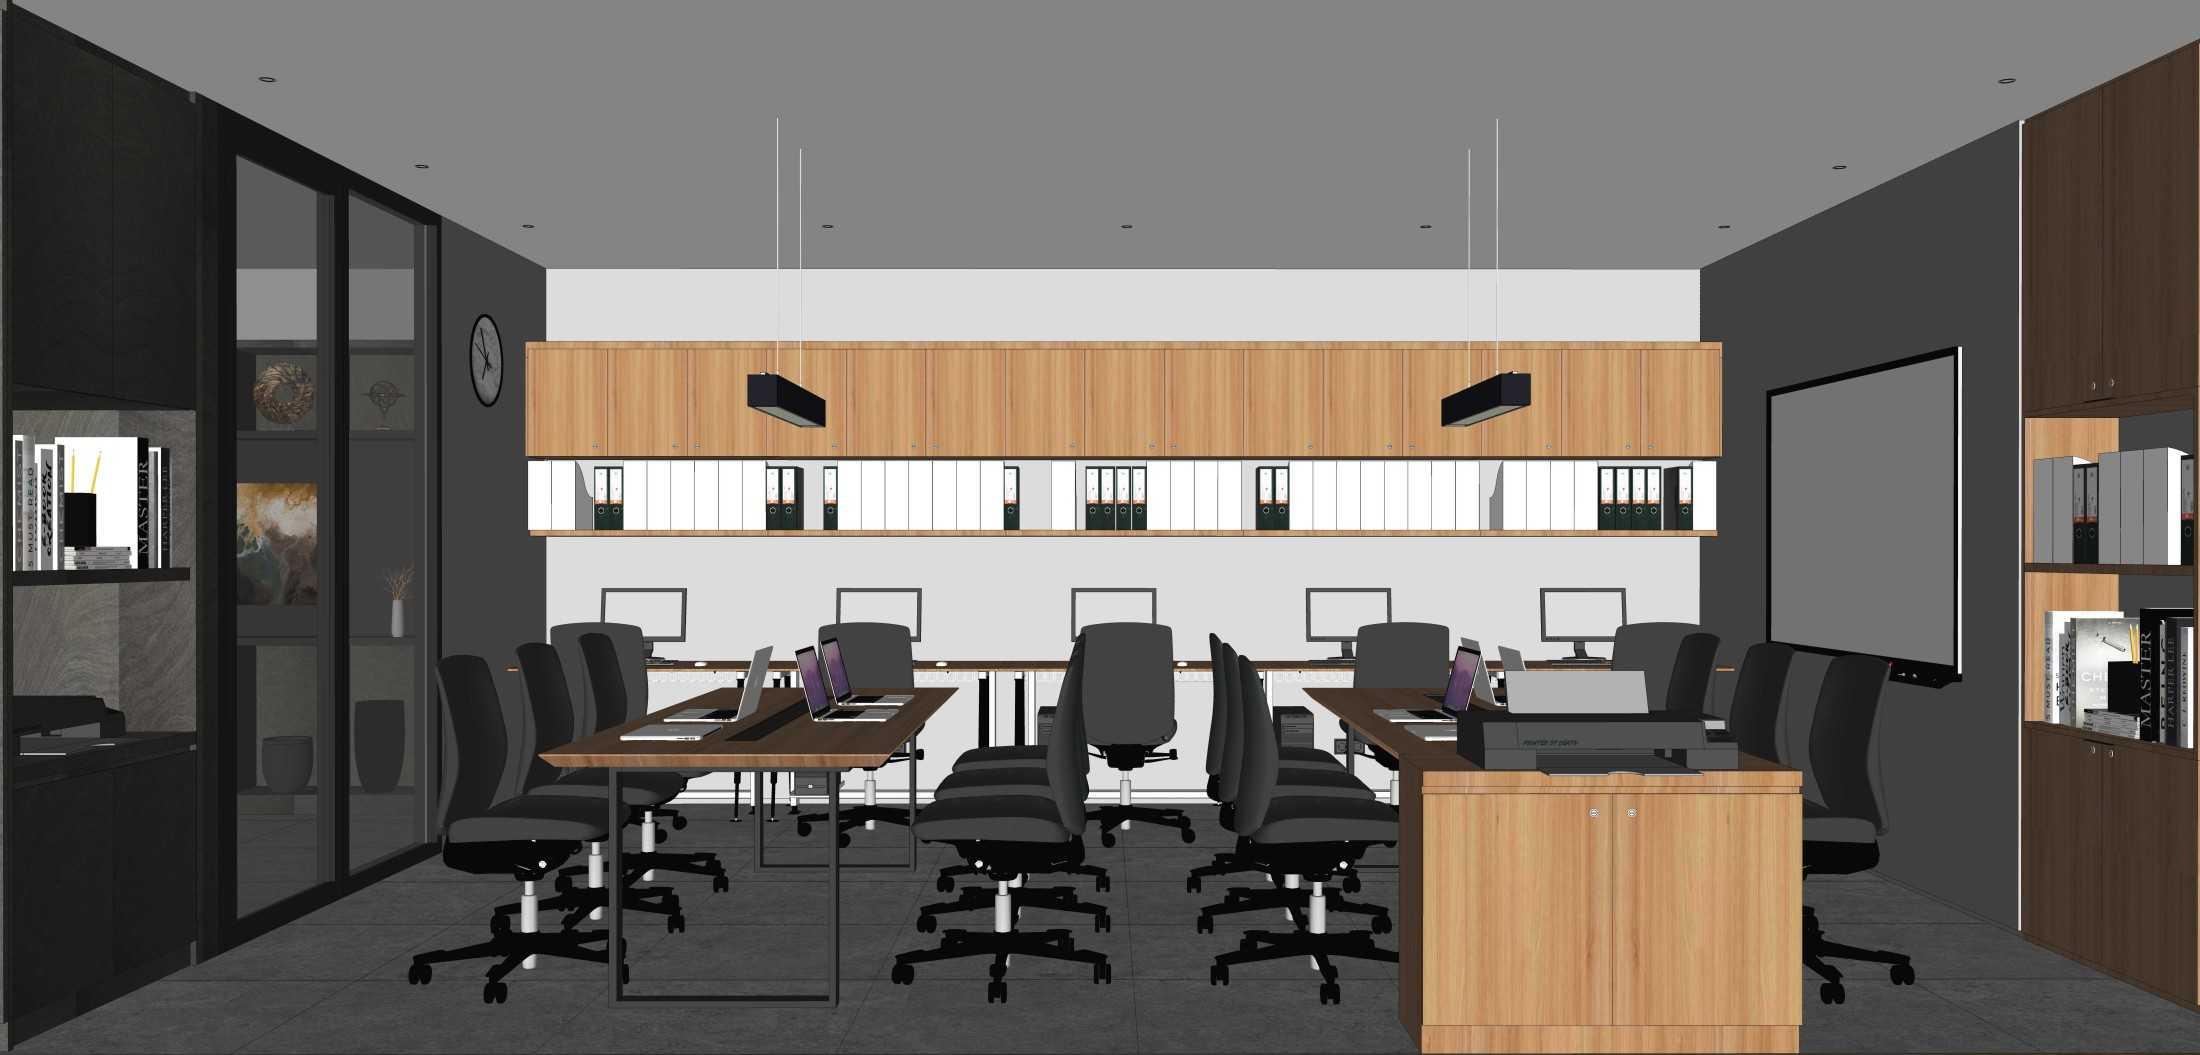 Pt. Modula Adeha Office Jakarta, Daerah Khusus Ibukota Jakarta, Indonesia Jakarta, Daerah Khusus Ibukota Jakarta, Indonesia Pt-Modula-Adeha-Office  92093